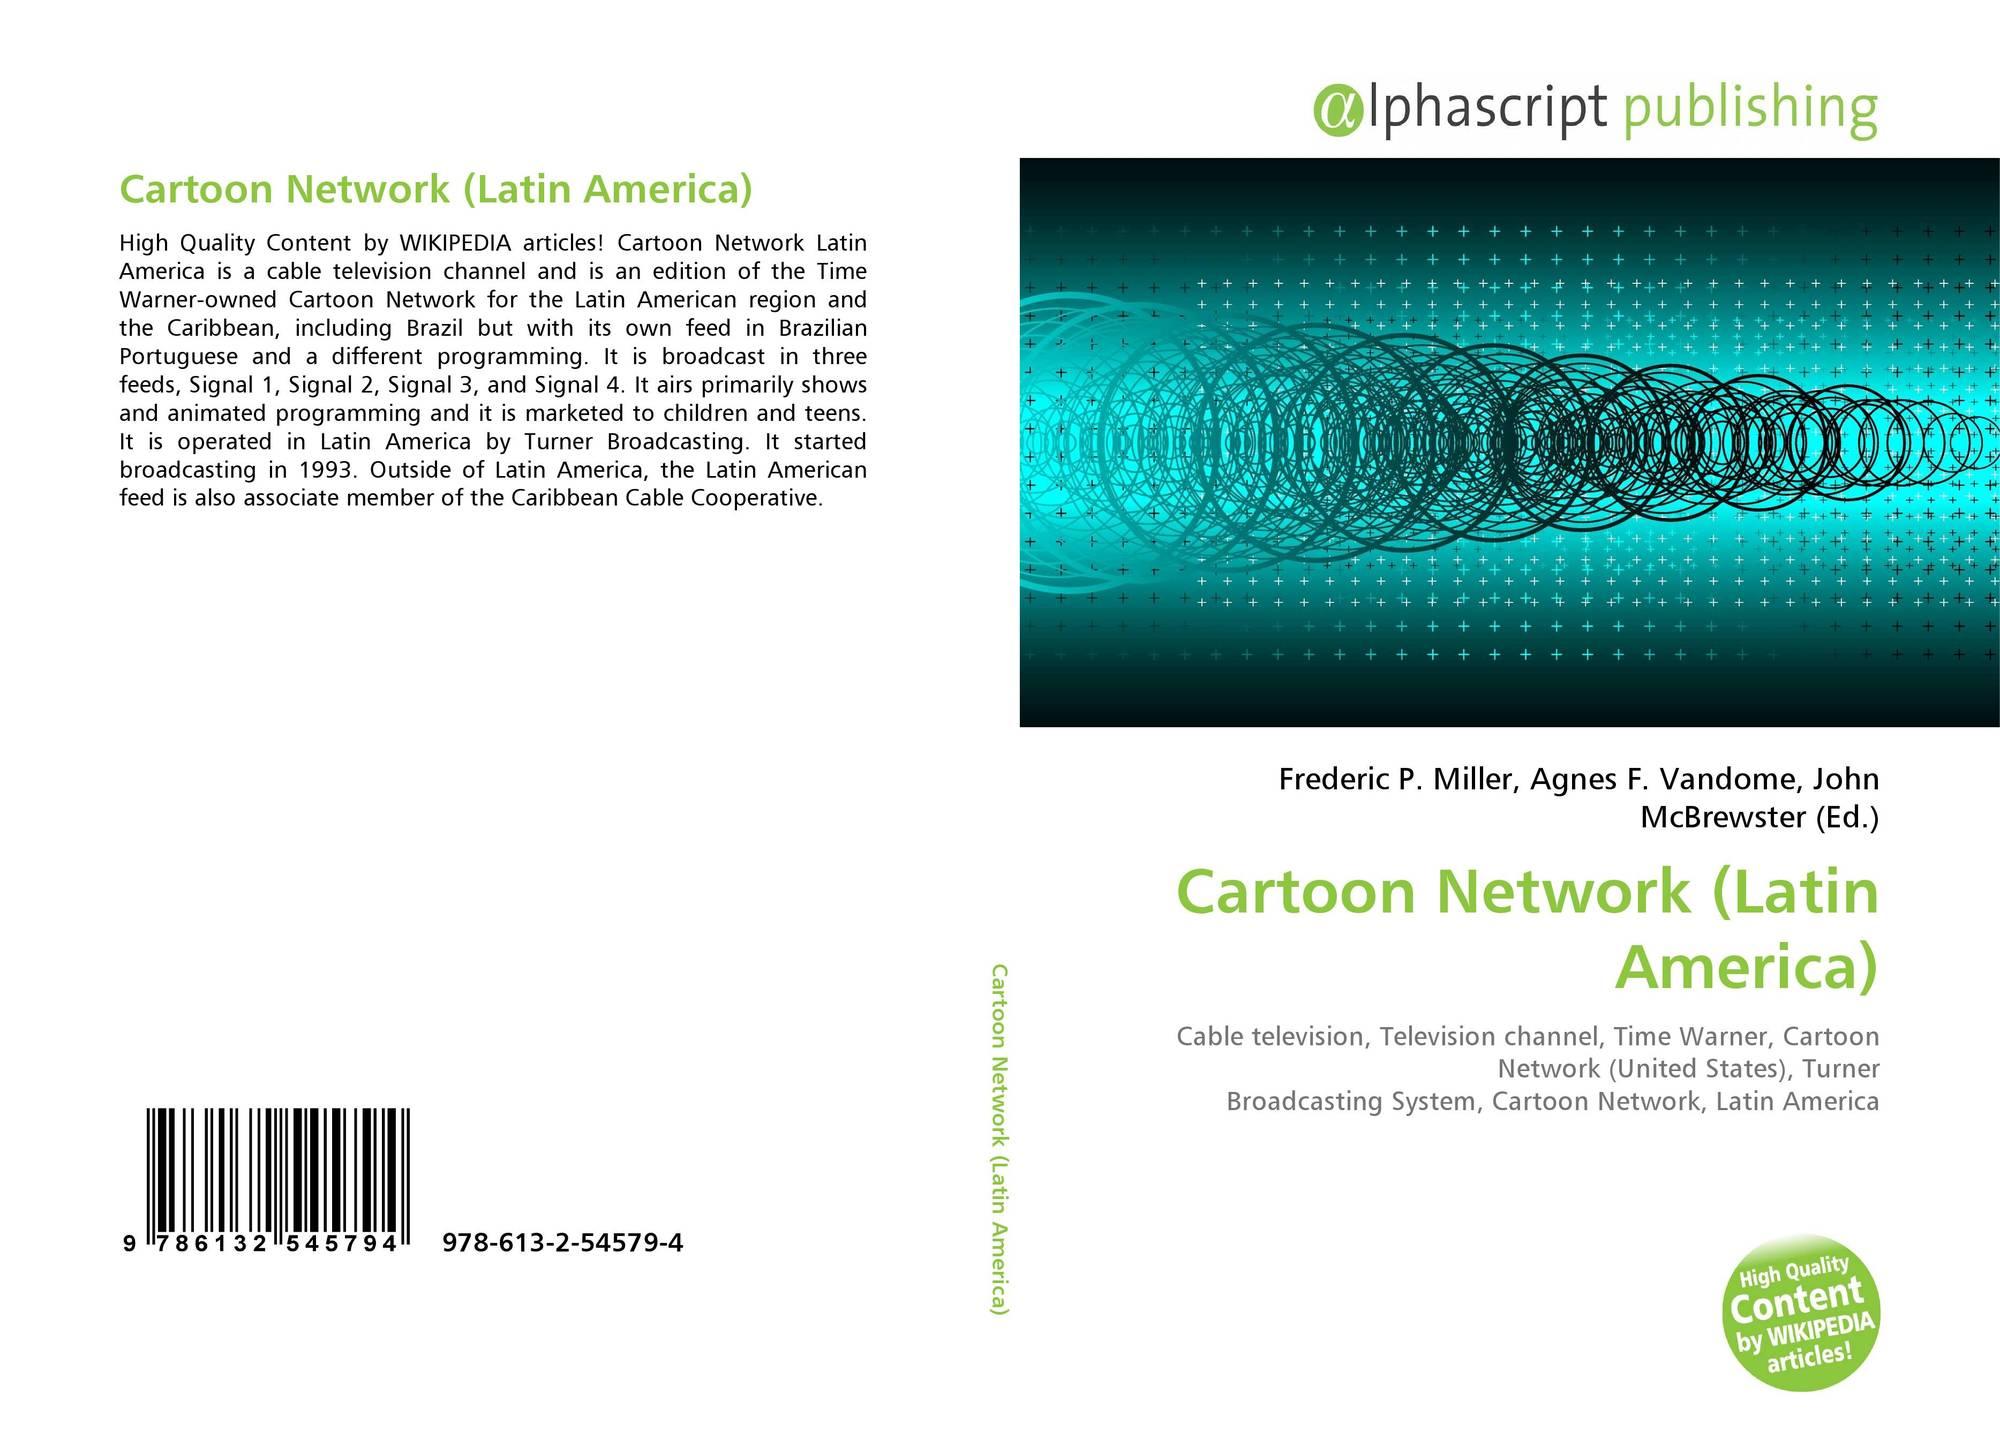 Cartoon Network Latin America 978 613 2 54579 4 6132545794